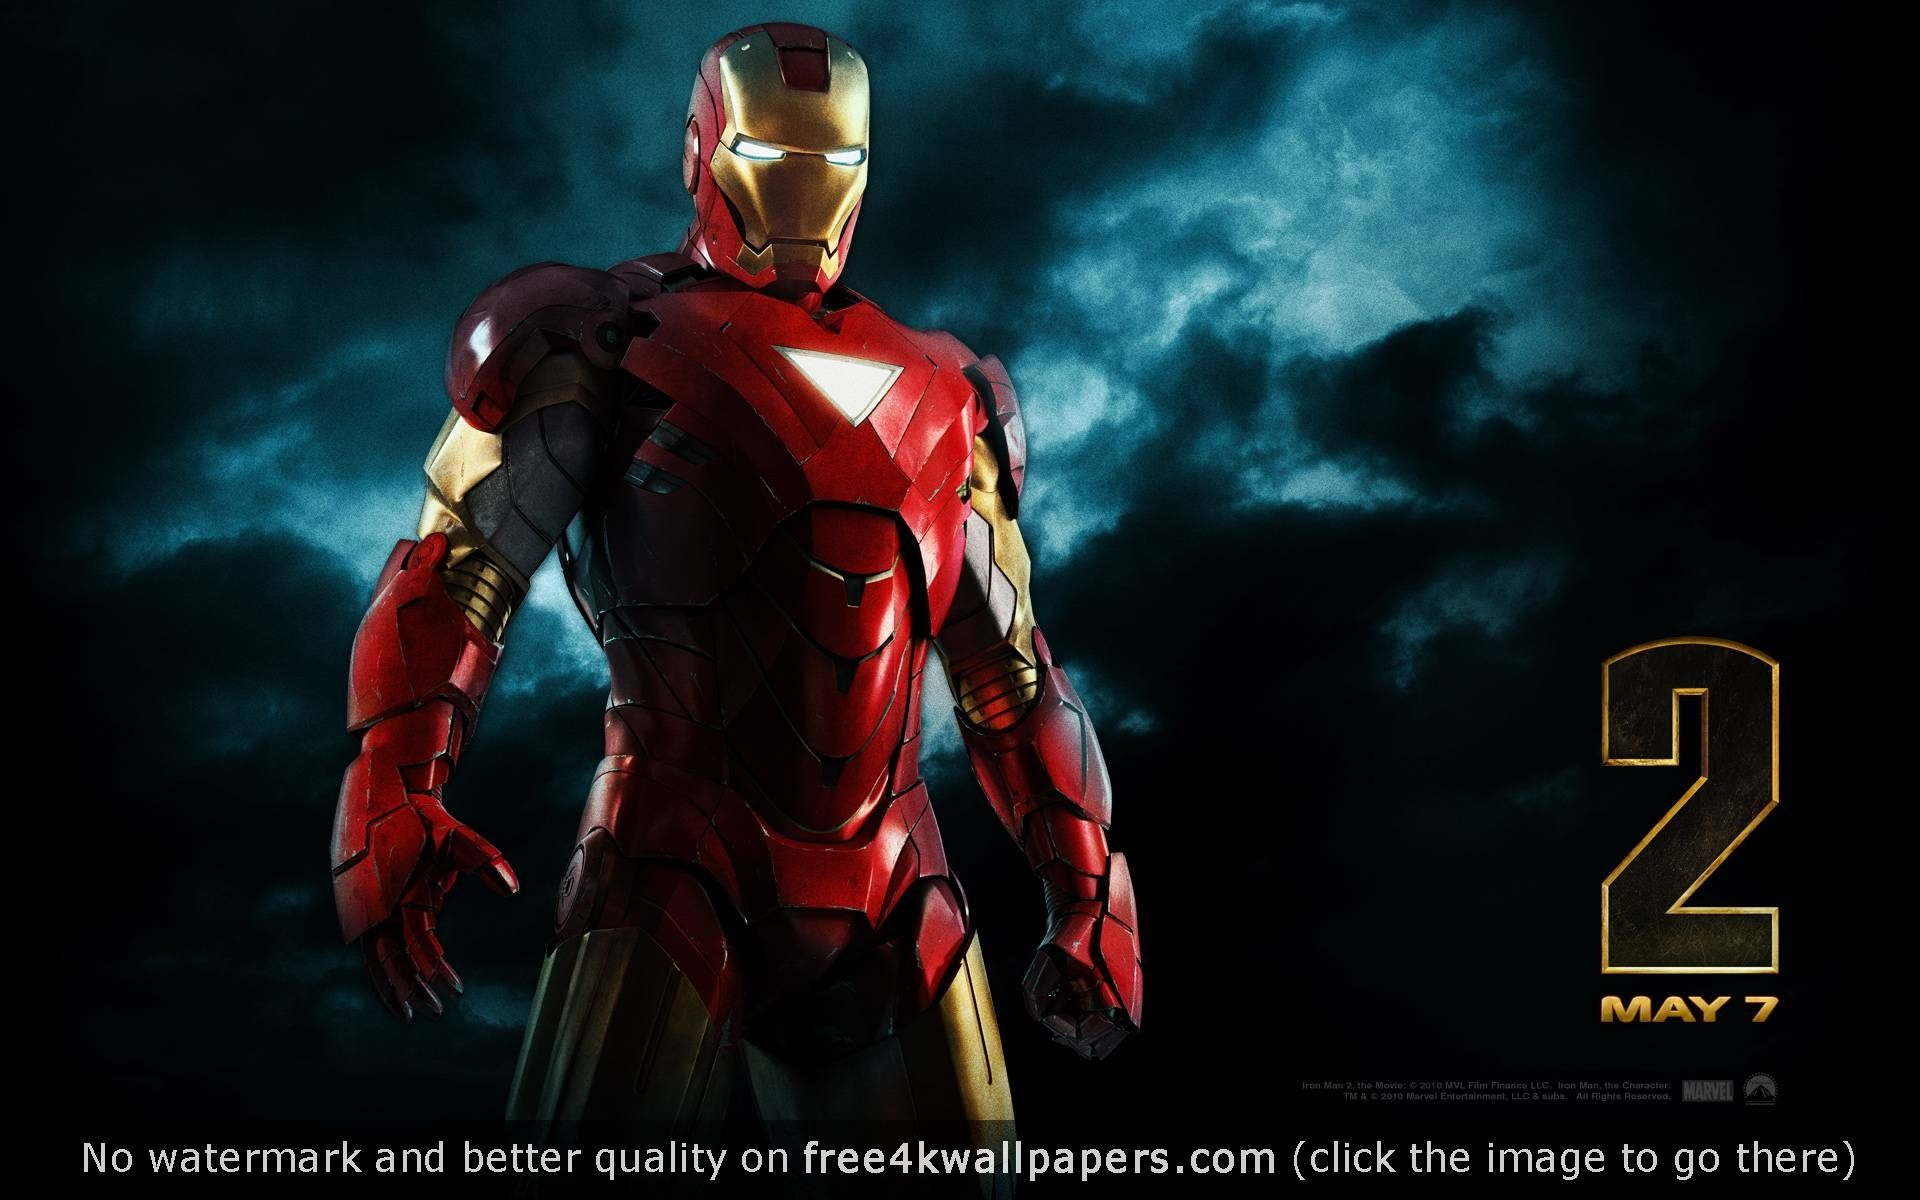 Iron Man 2 Hd Wallpaper Download Iron Man 2 Hd Wallpaper For Your